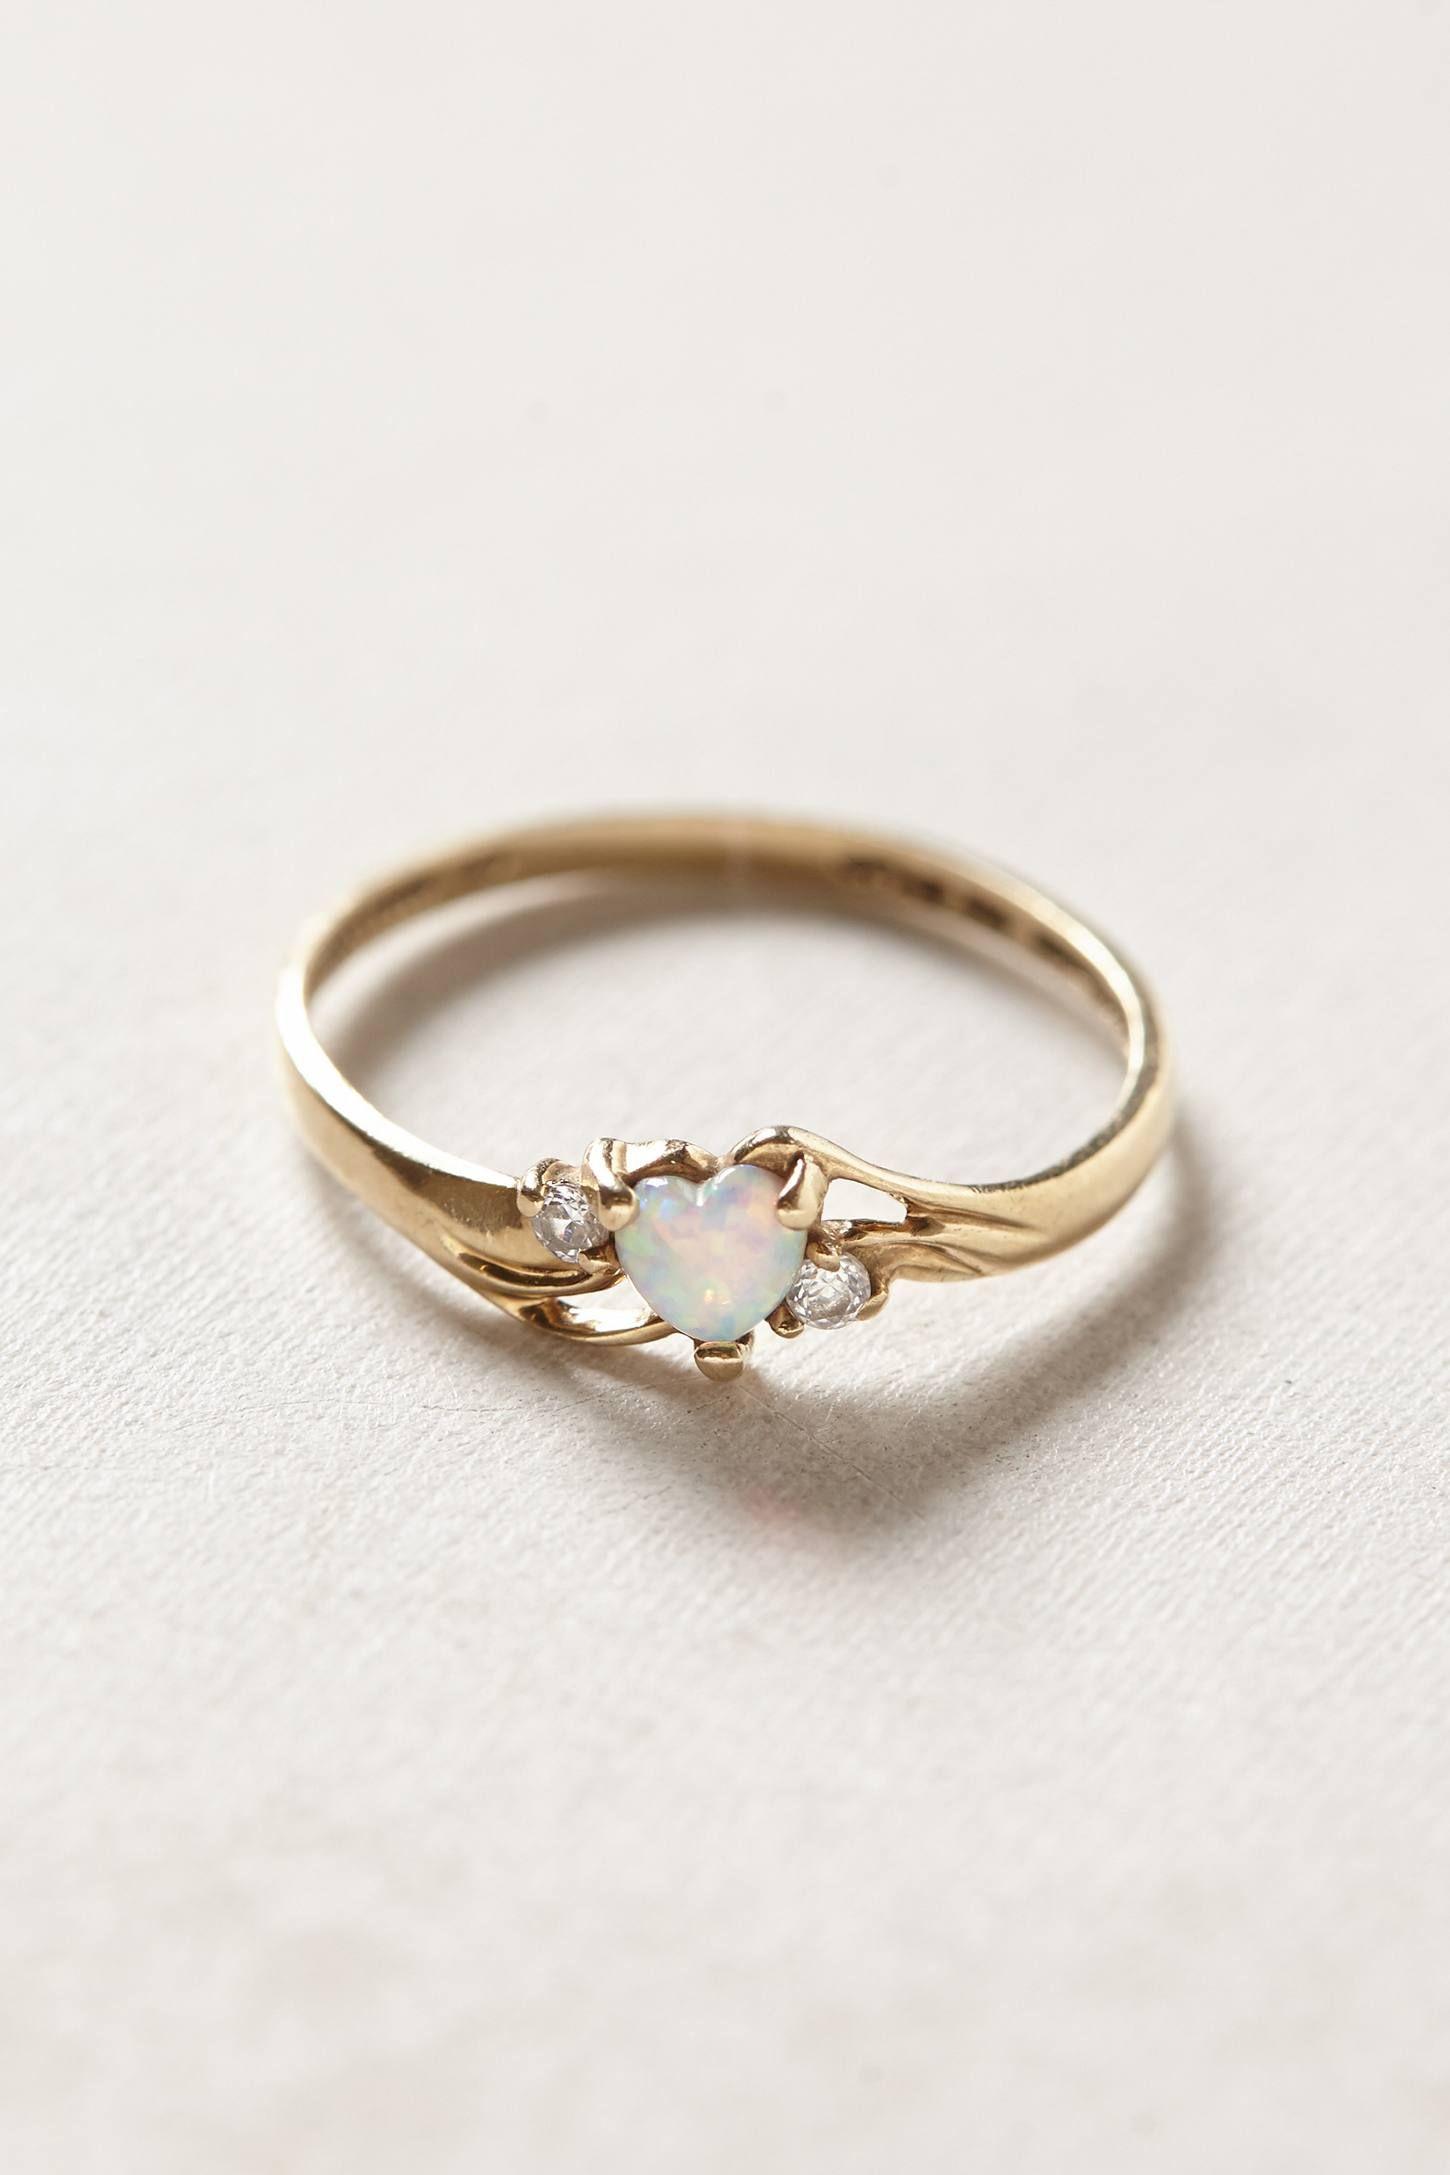 Vintage Opal Heart Ring   Jewelry, Vintage jewelry, Cute